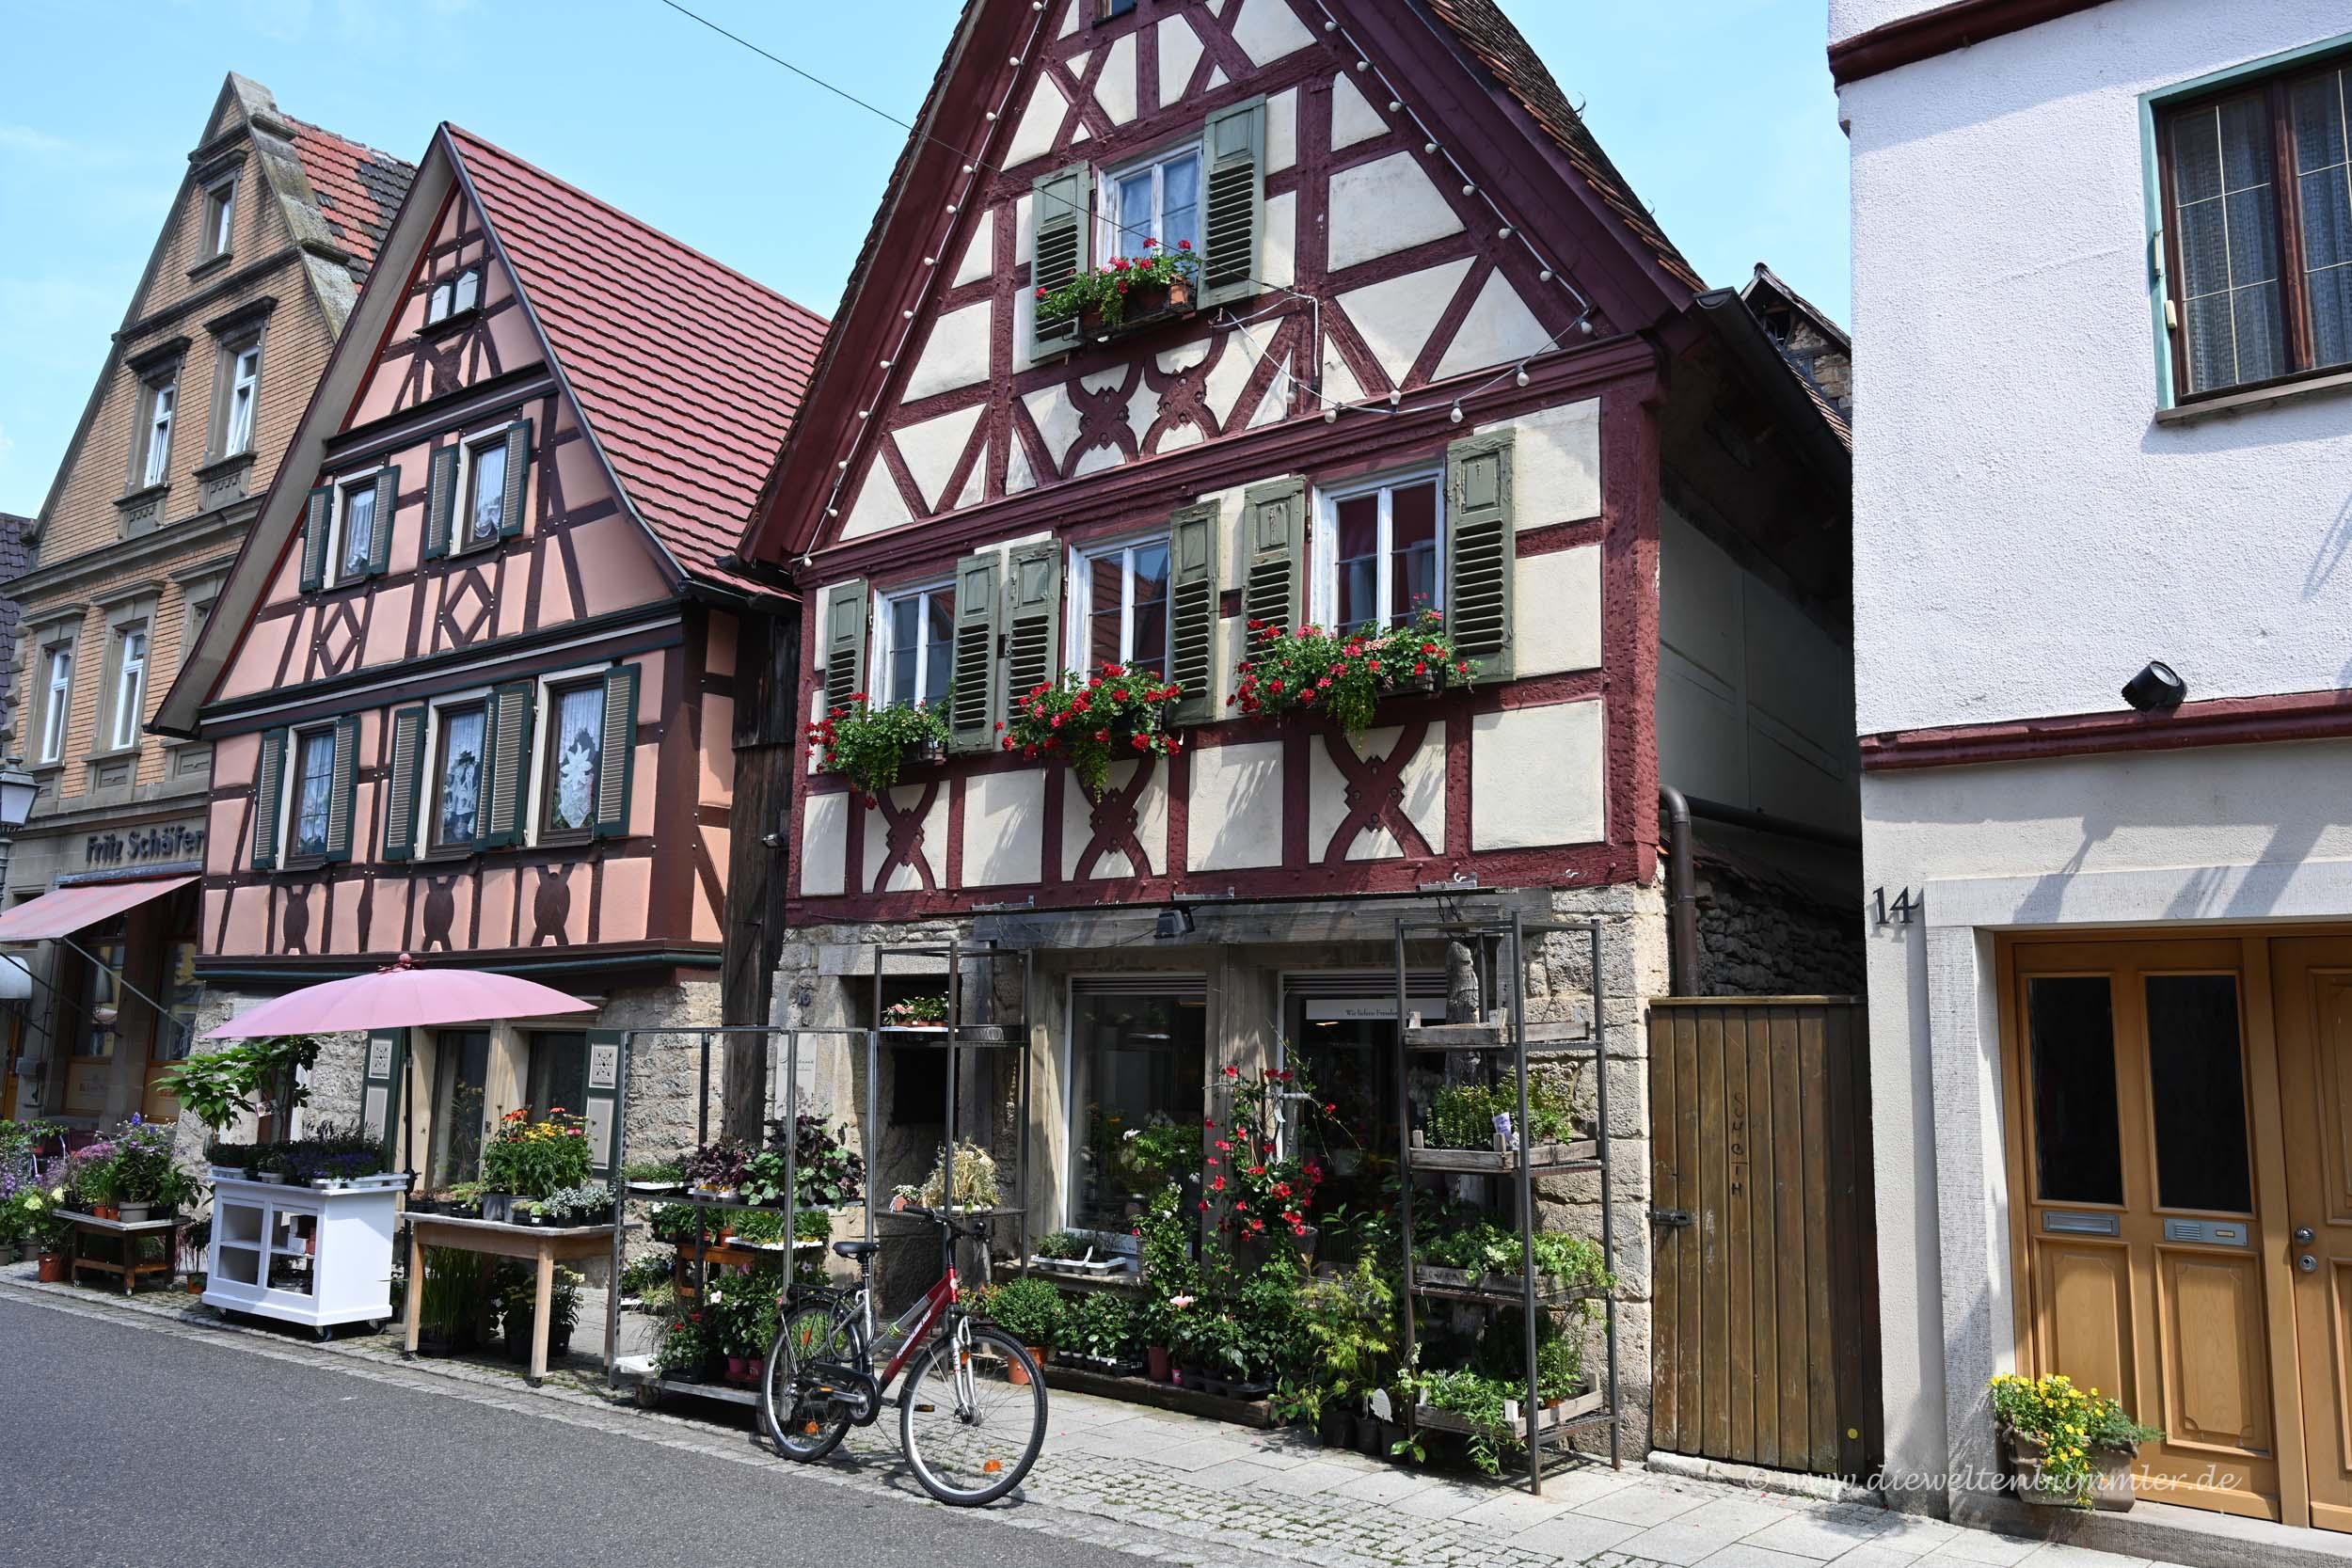 Altstadt an der Tauber